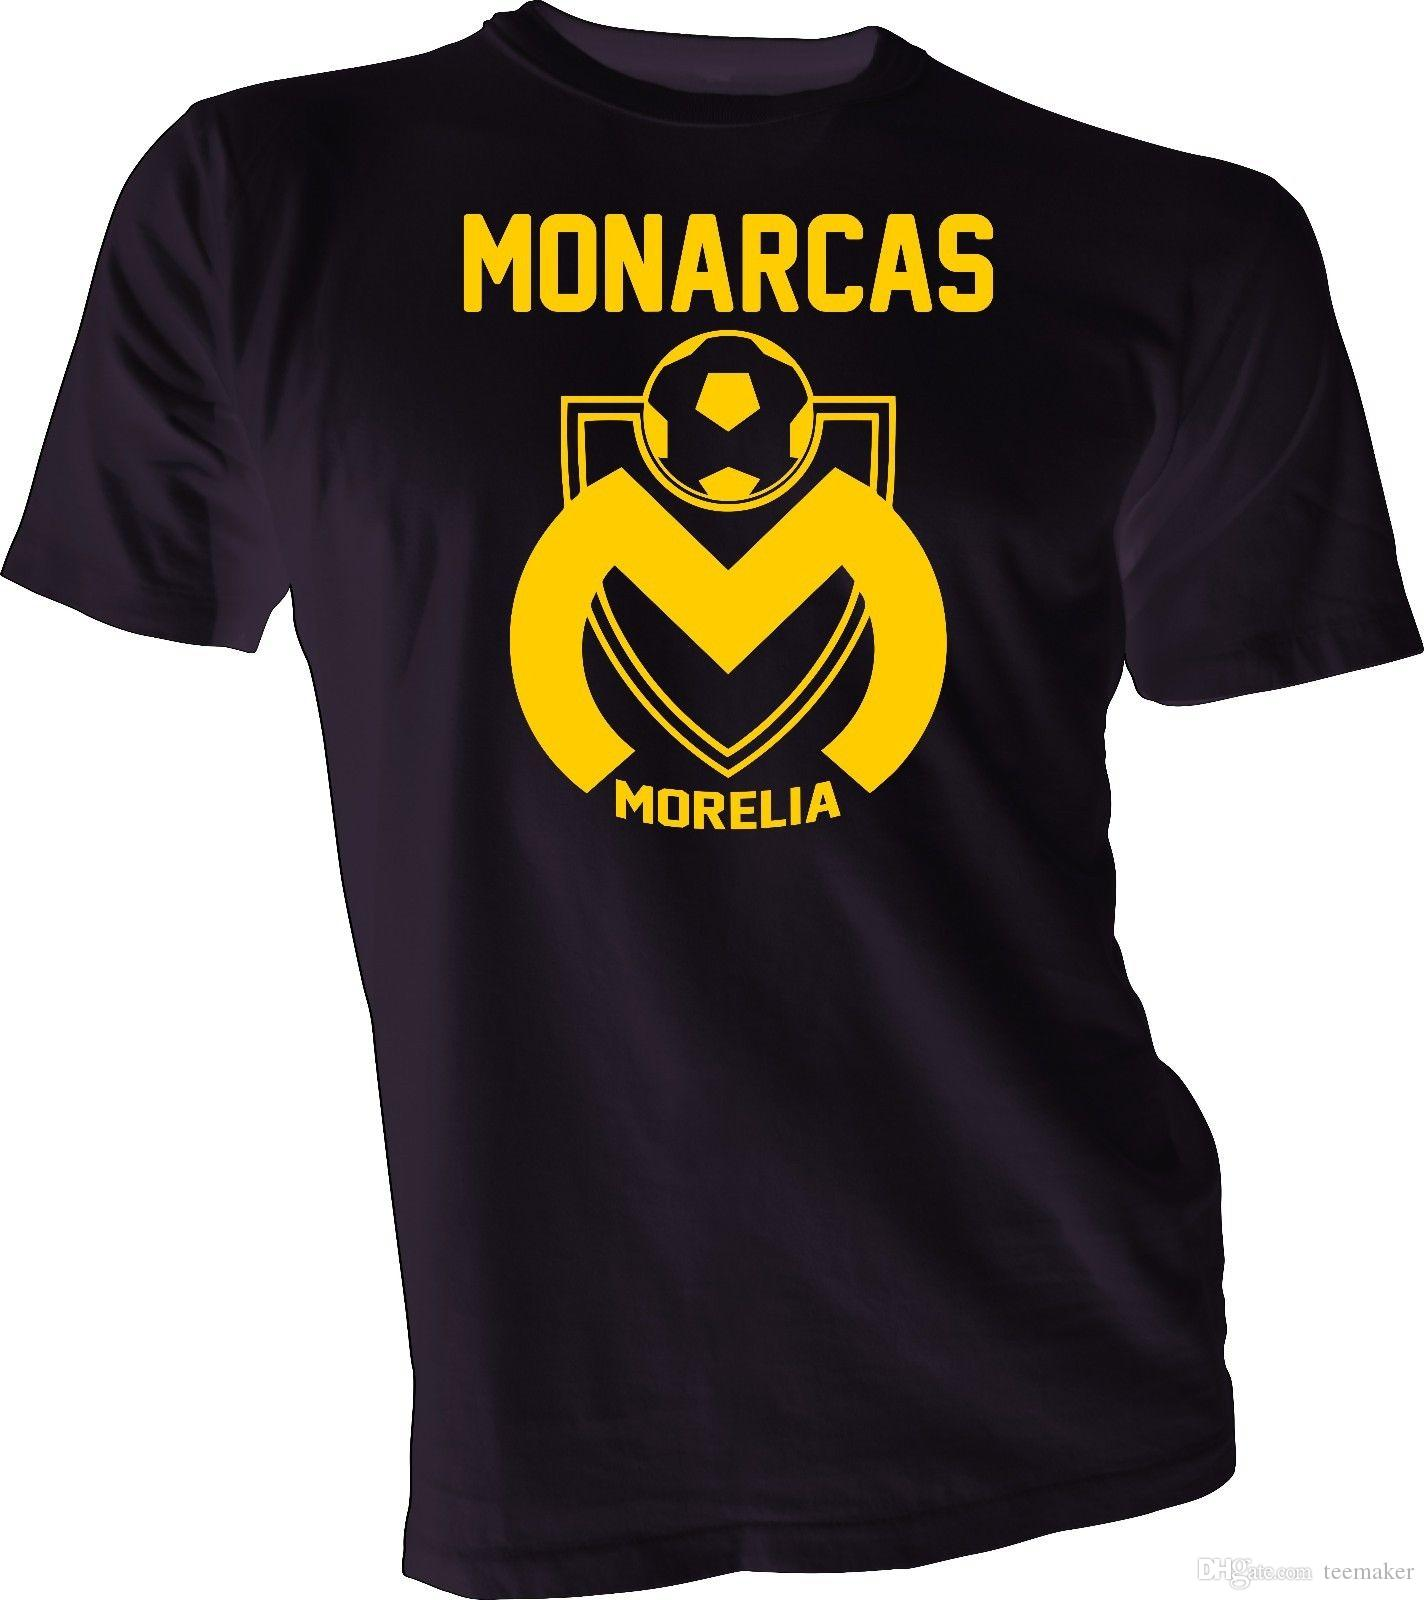 e0dd56deb2b92 Compre Camiseta Monarcas Morelia De Mexico Futbol Soccer Camiseta Handmade  Unisex Nueva Camiseta 3XL Camisetas Personalizadas De Manga Corta Equipo  Popular ...